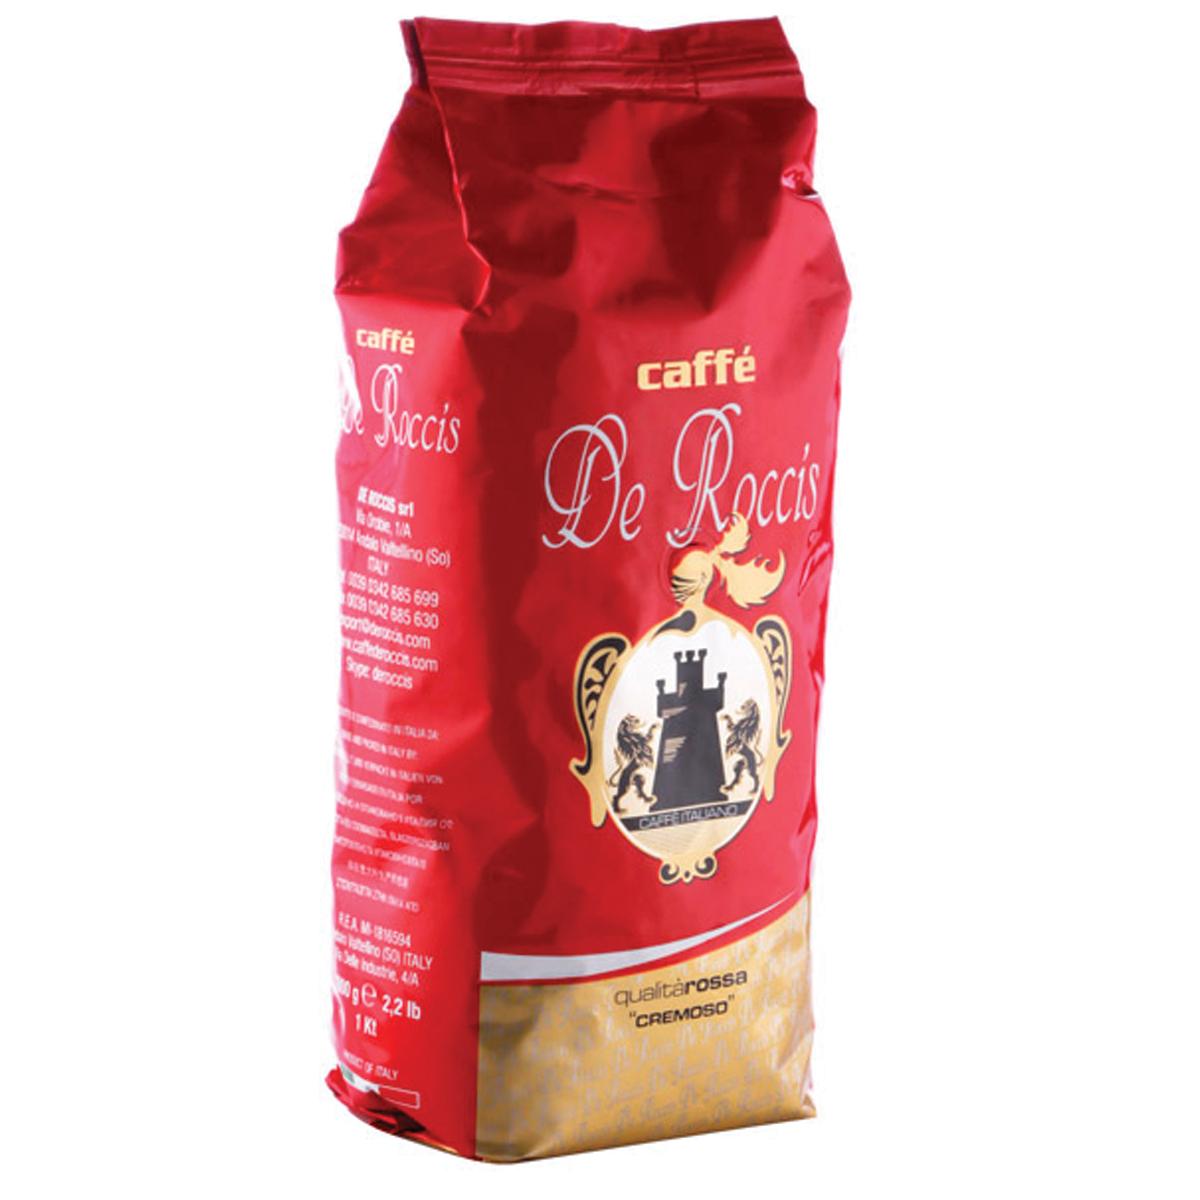 De Roccis Rossa кофе в зернах, 1 кг lavazza grande ristorazione rossa кофе в зернах 1 кг